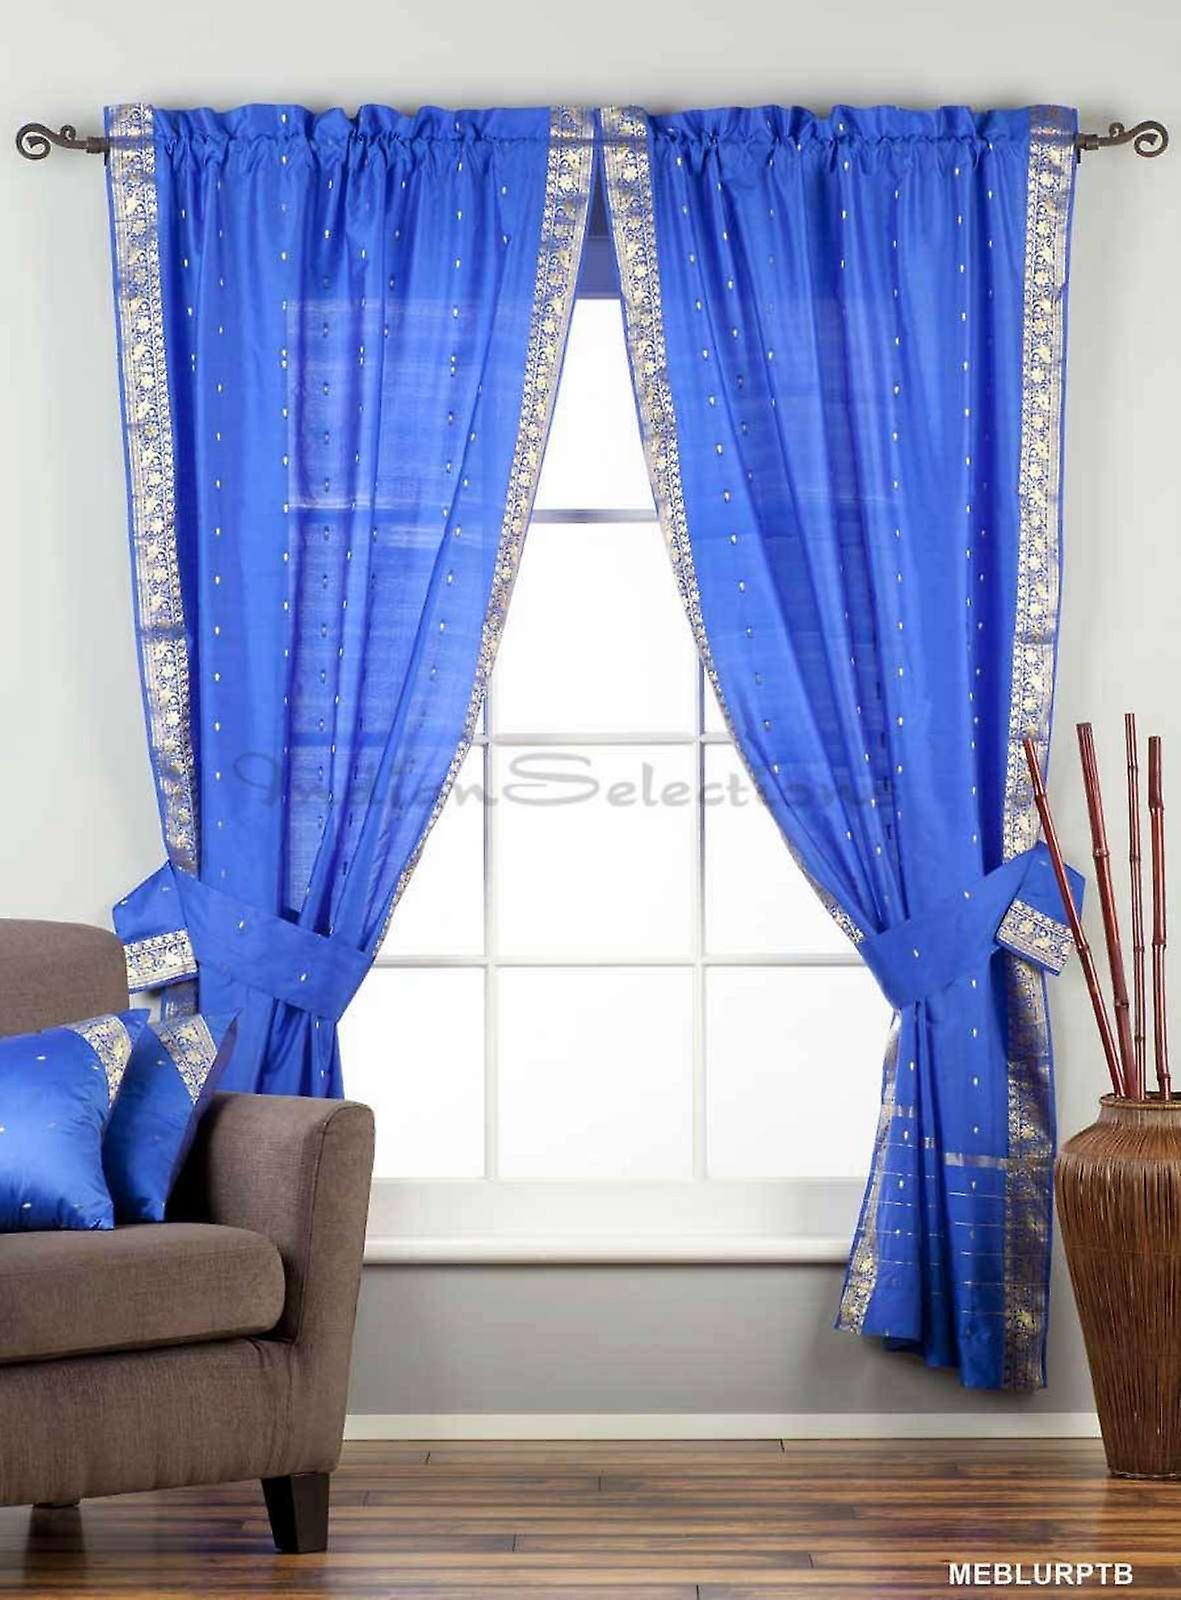 Indo Enchanting Blue Rod Pocket Sheer Sari Curtain Drape Panel 43x84 in w/ matching tieback